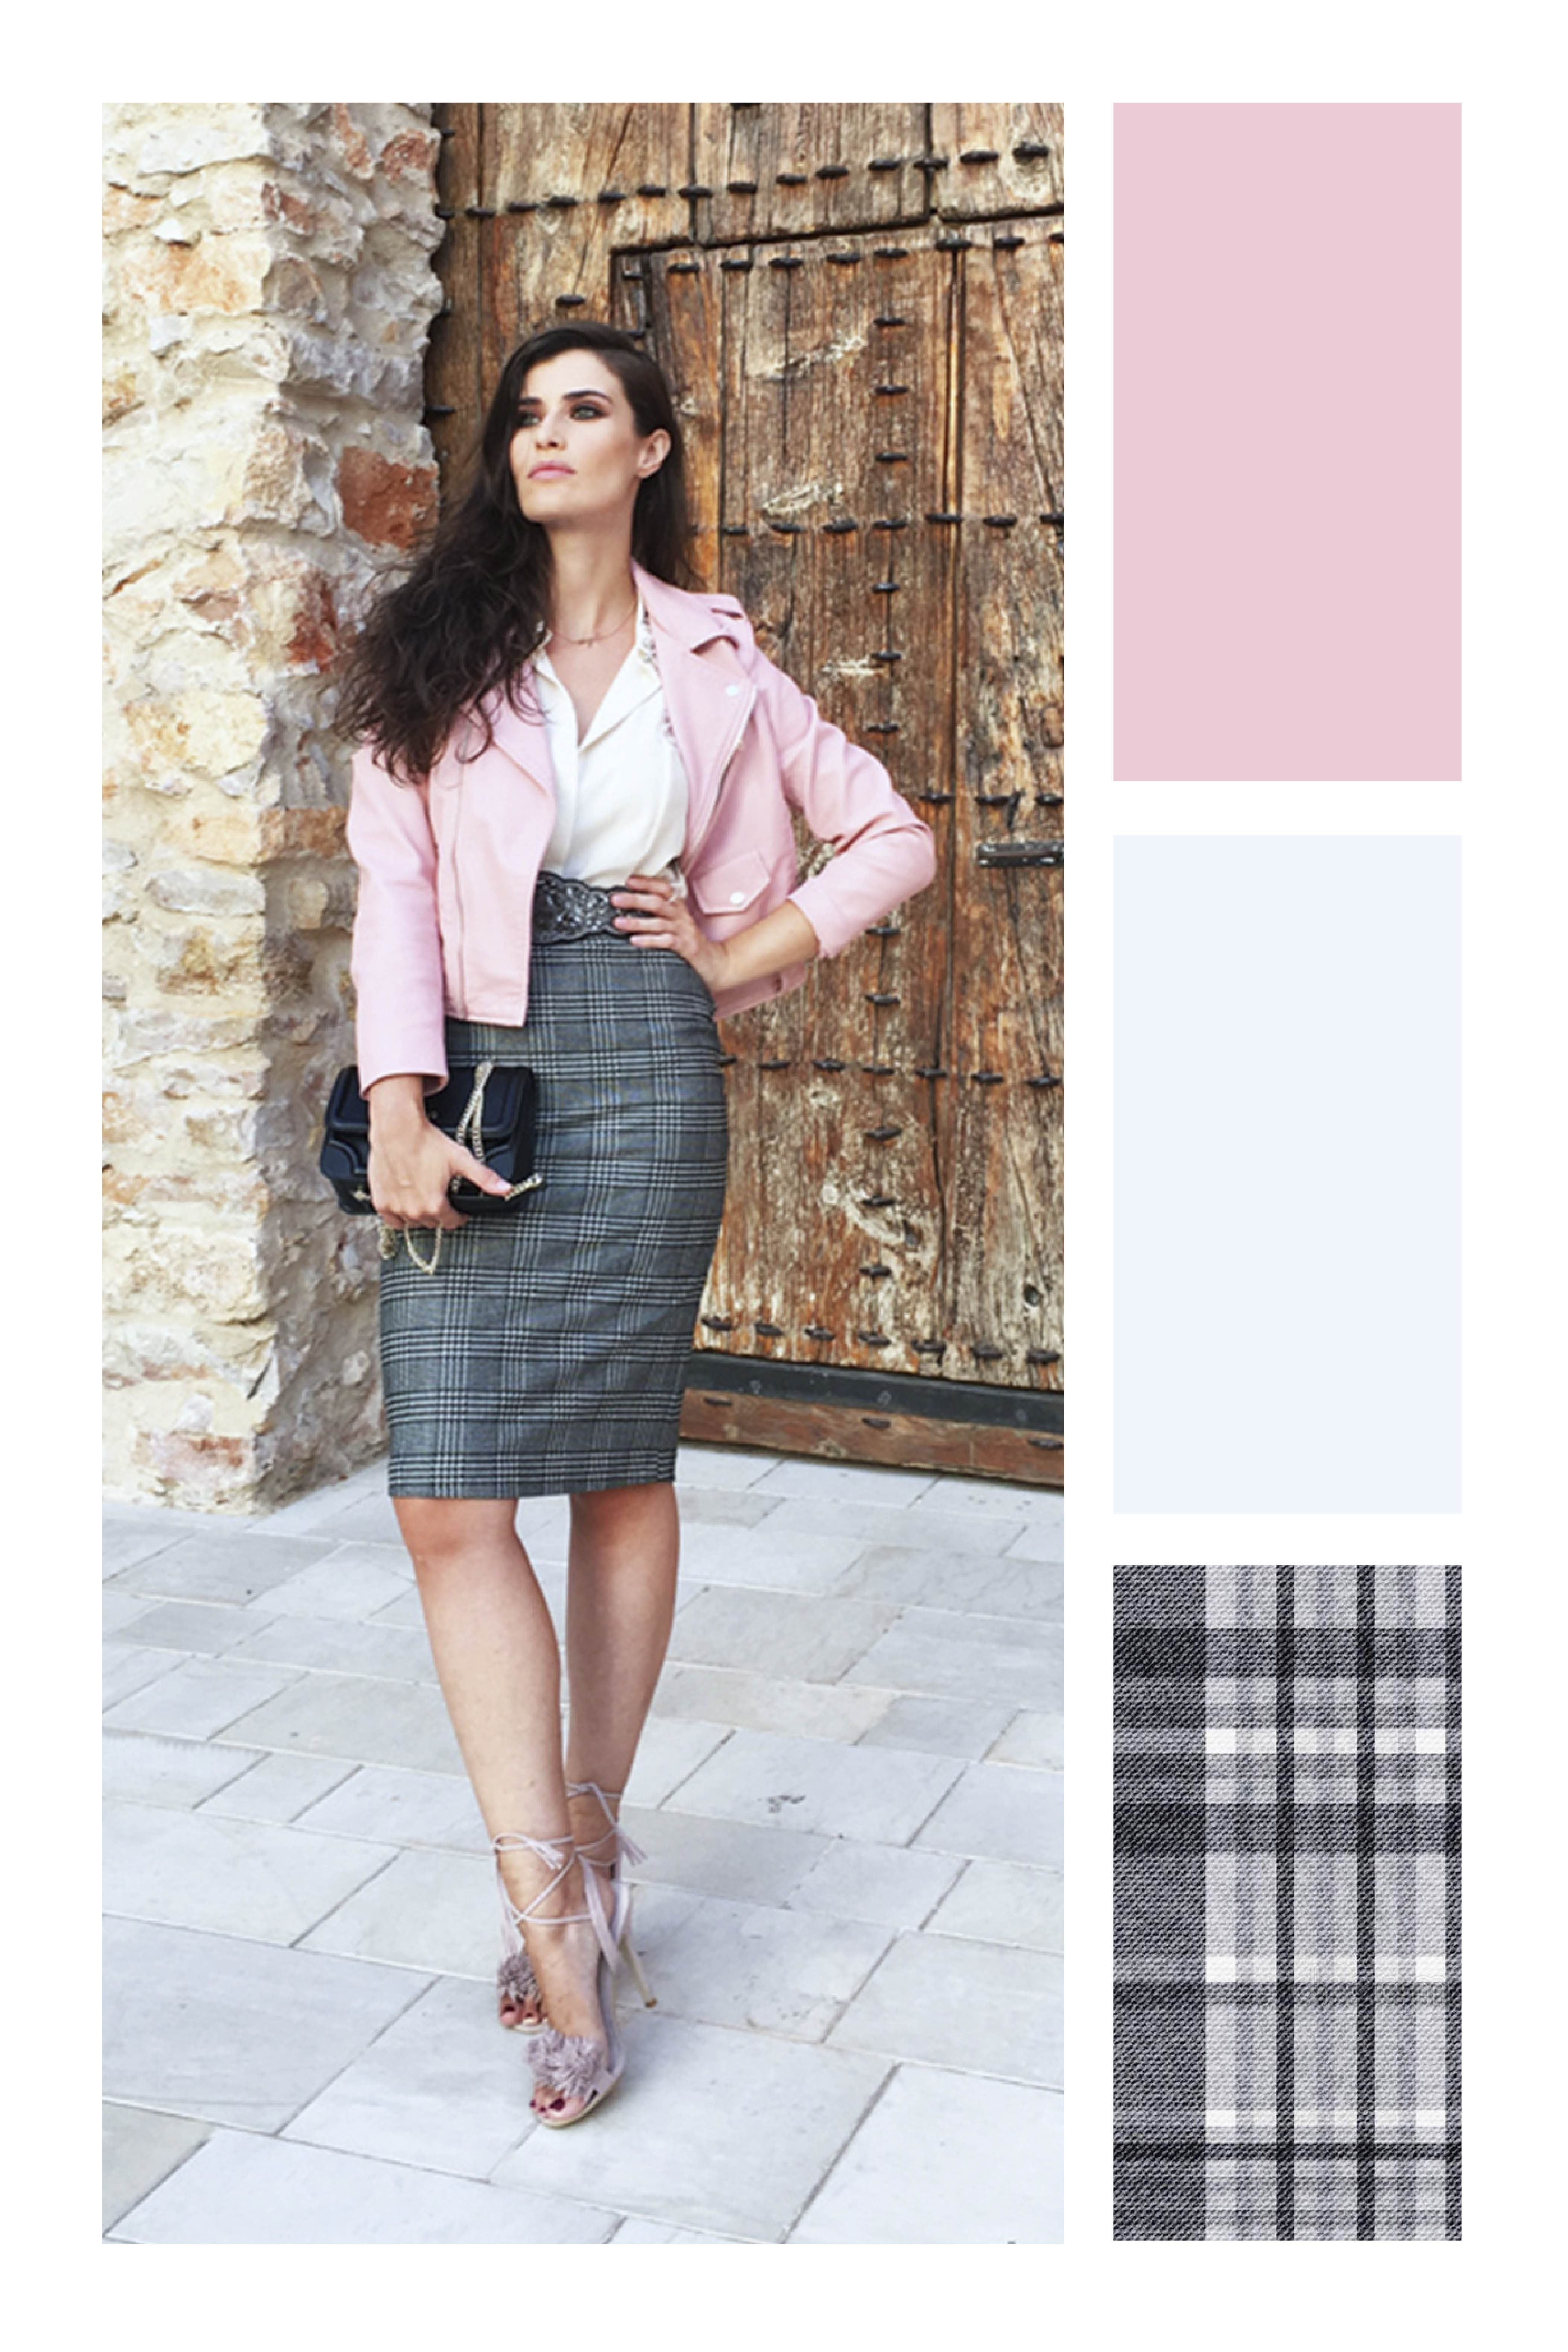 Falda lápiz  cinco estilos para organizar tus atuendos diarios  TiZKKAmoda   blazer  rosa  falda  lápiz  gris  cuadros  look  blusa  blanca 6cb0127bdff8